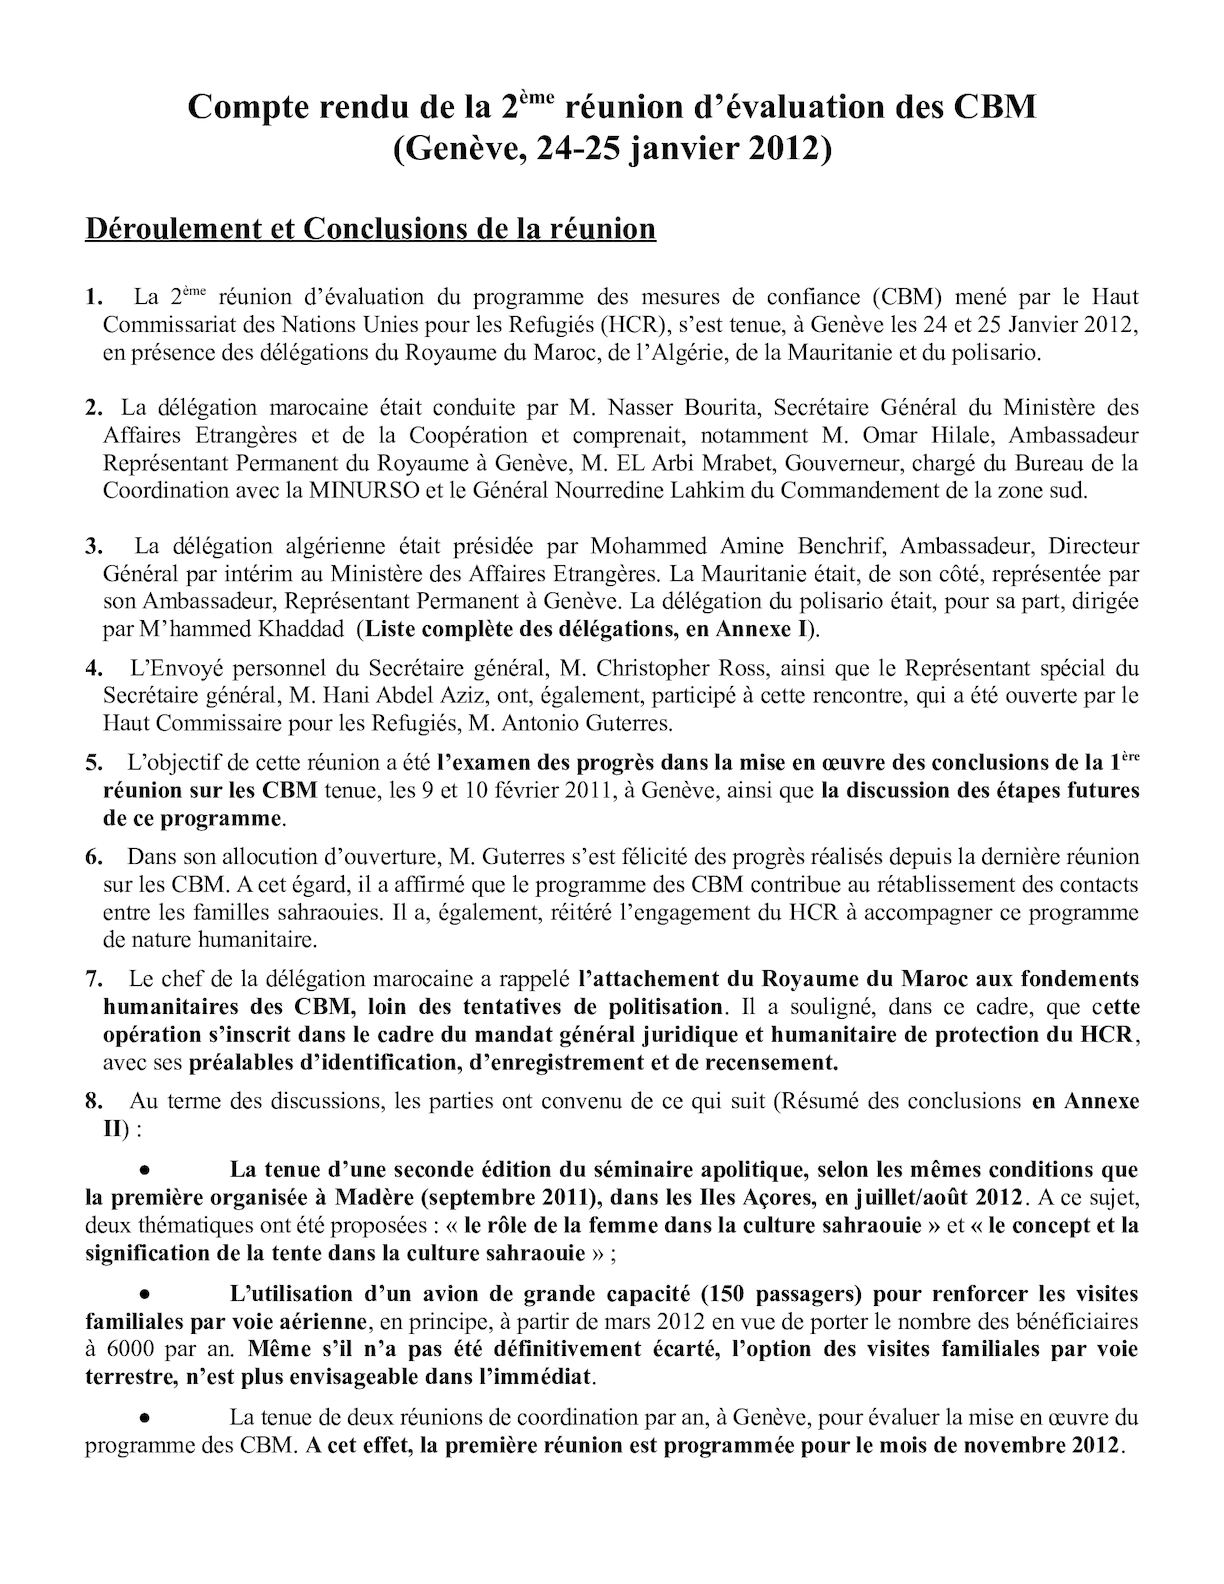 Compte Rendu Réunion éva CBM 2012